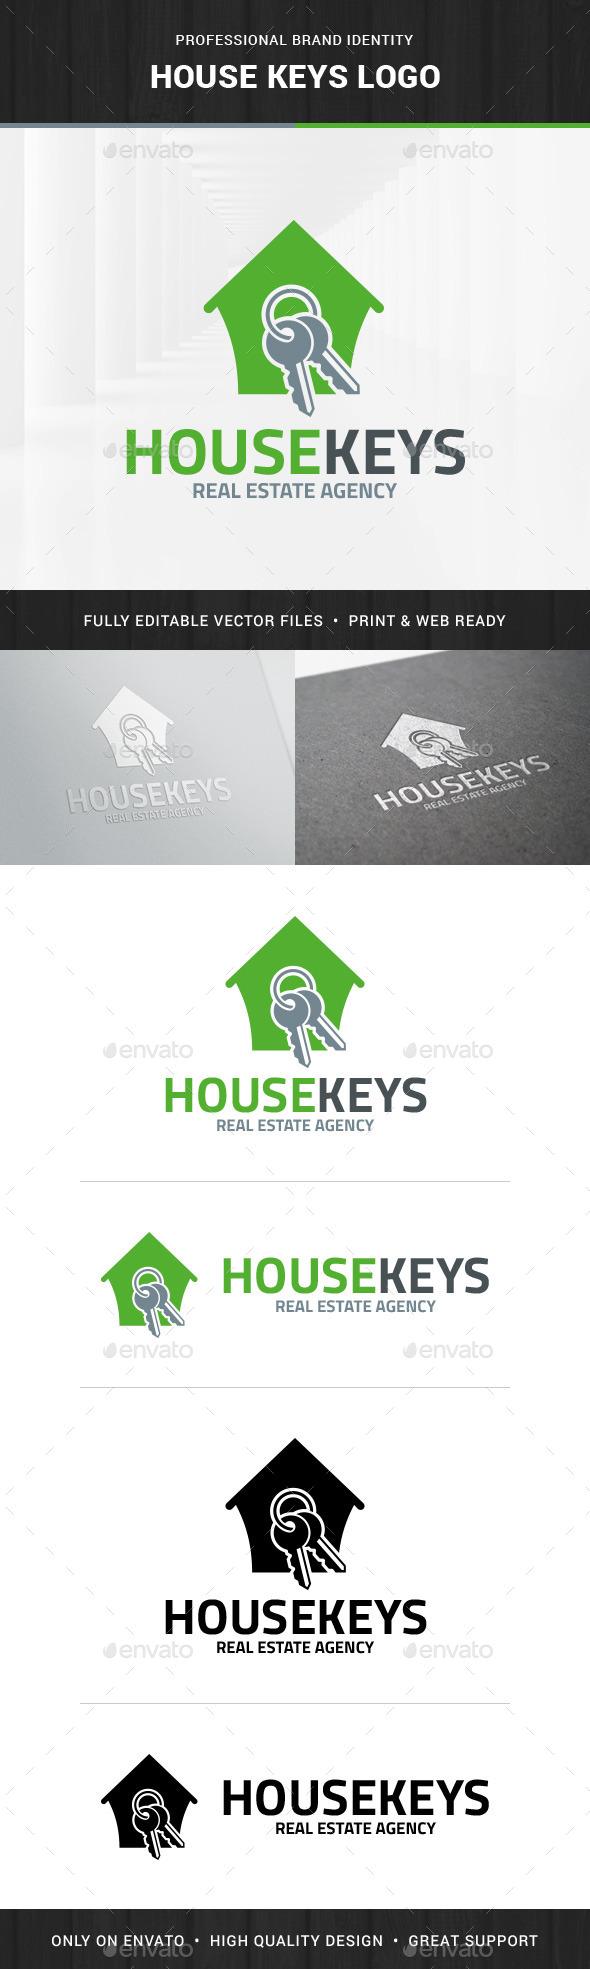 House Keys Logo Template